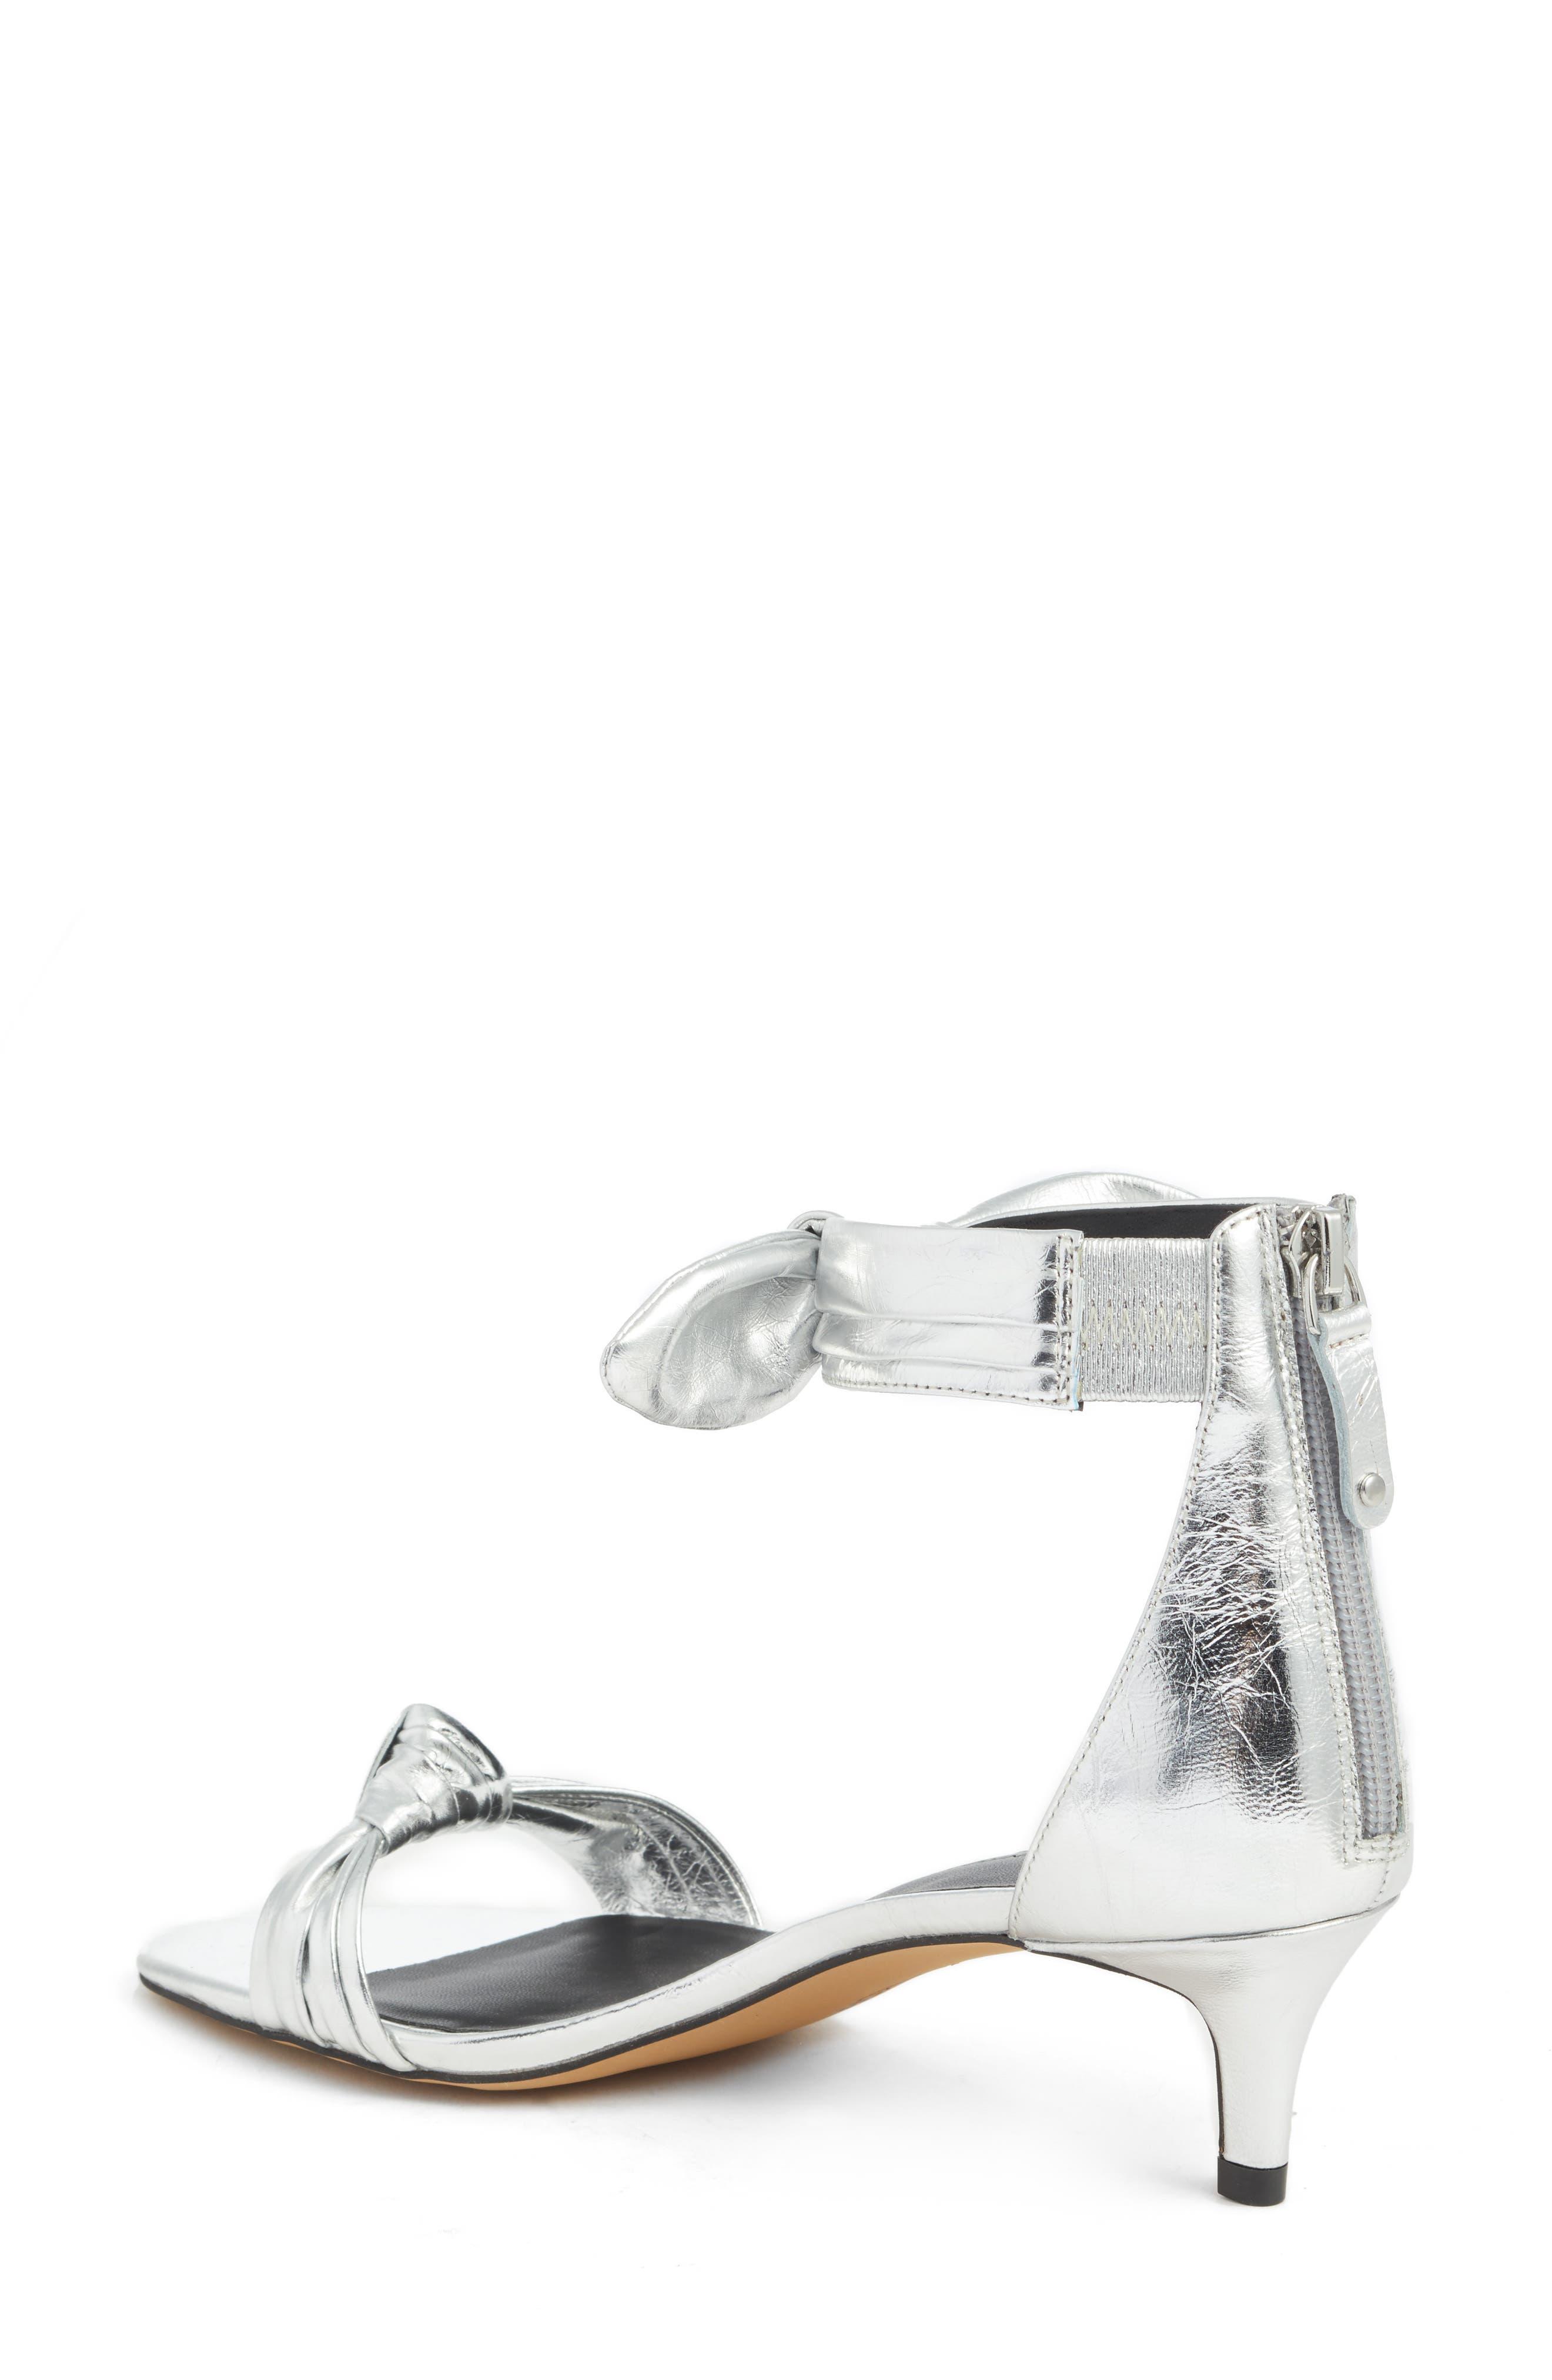 Kaley Knotted Kitten Heel Sandal,                             Alternate thumbnail 2, color,                             Silver Metallic Leather